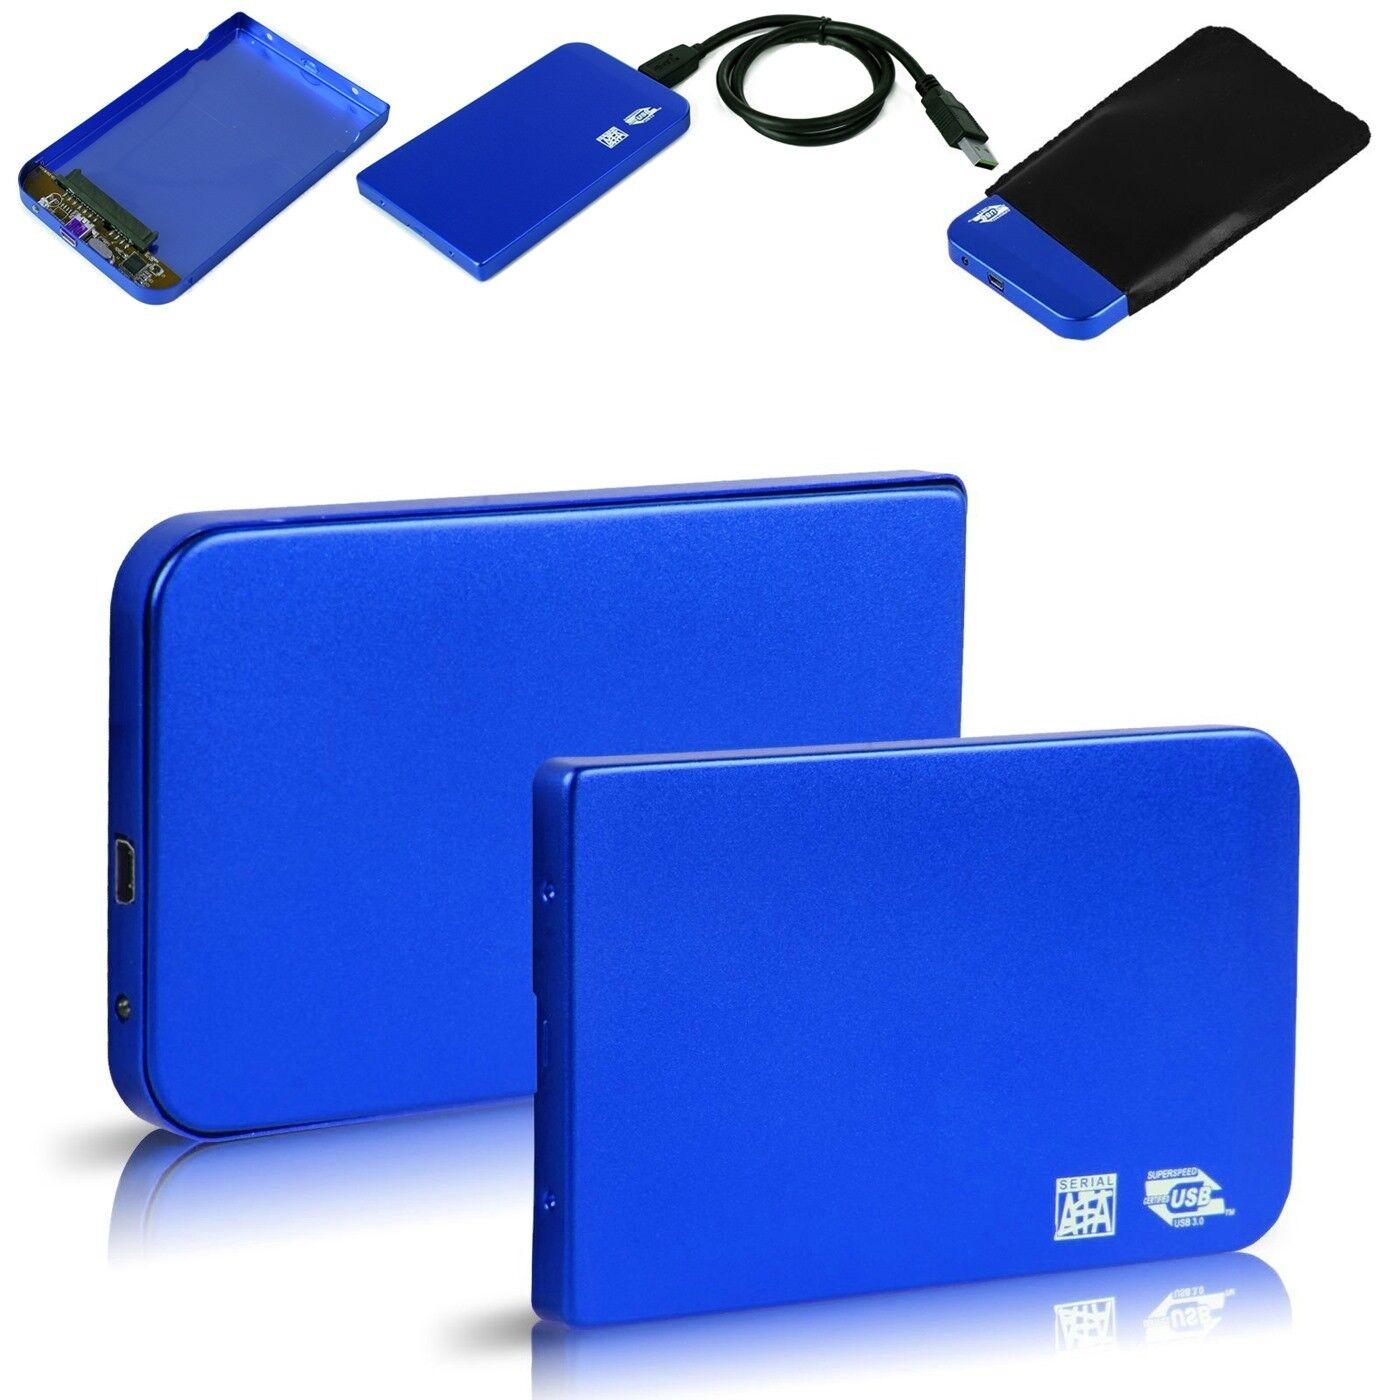 HDE Hard Drive Enclosure 2.5 Inch SATA to USB 3.0 External T